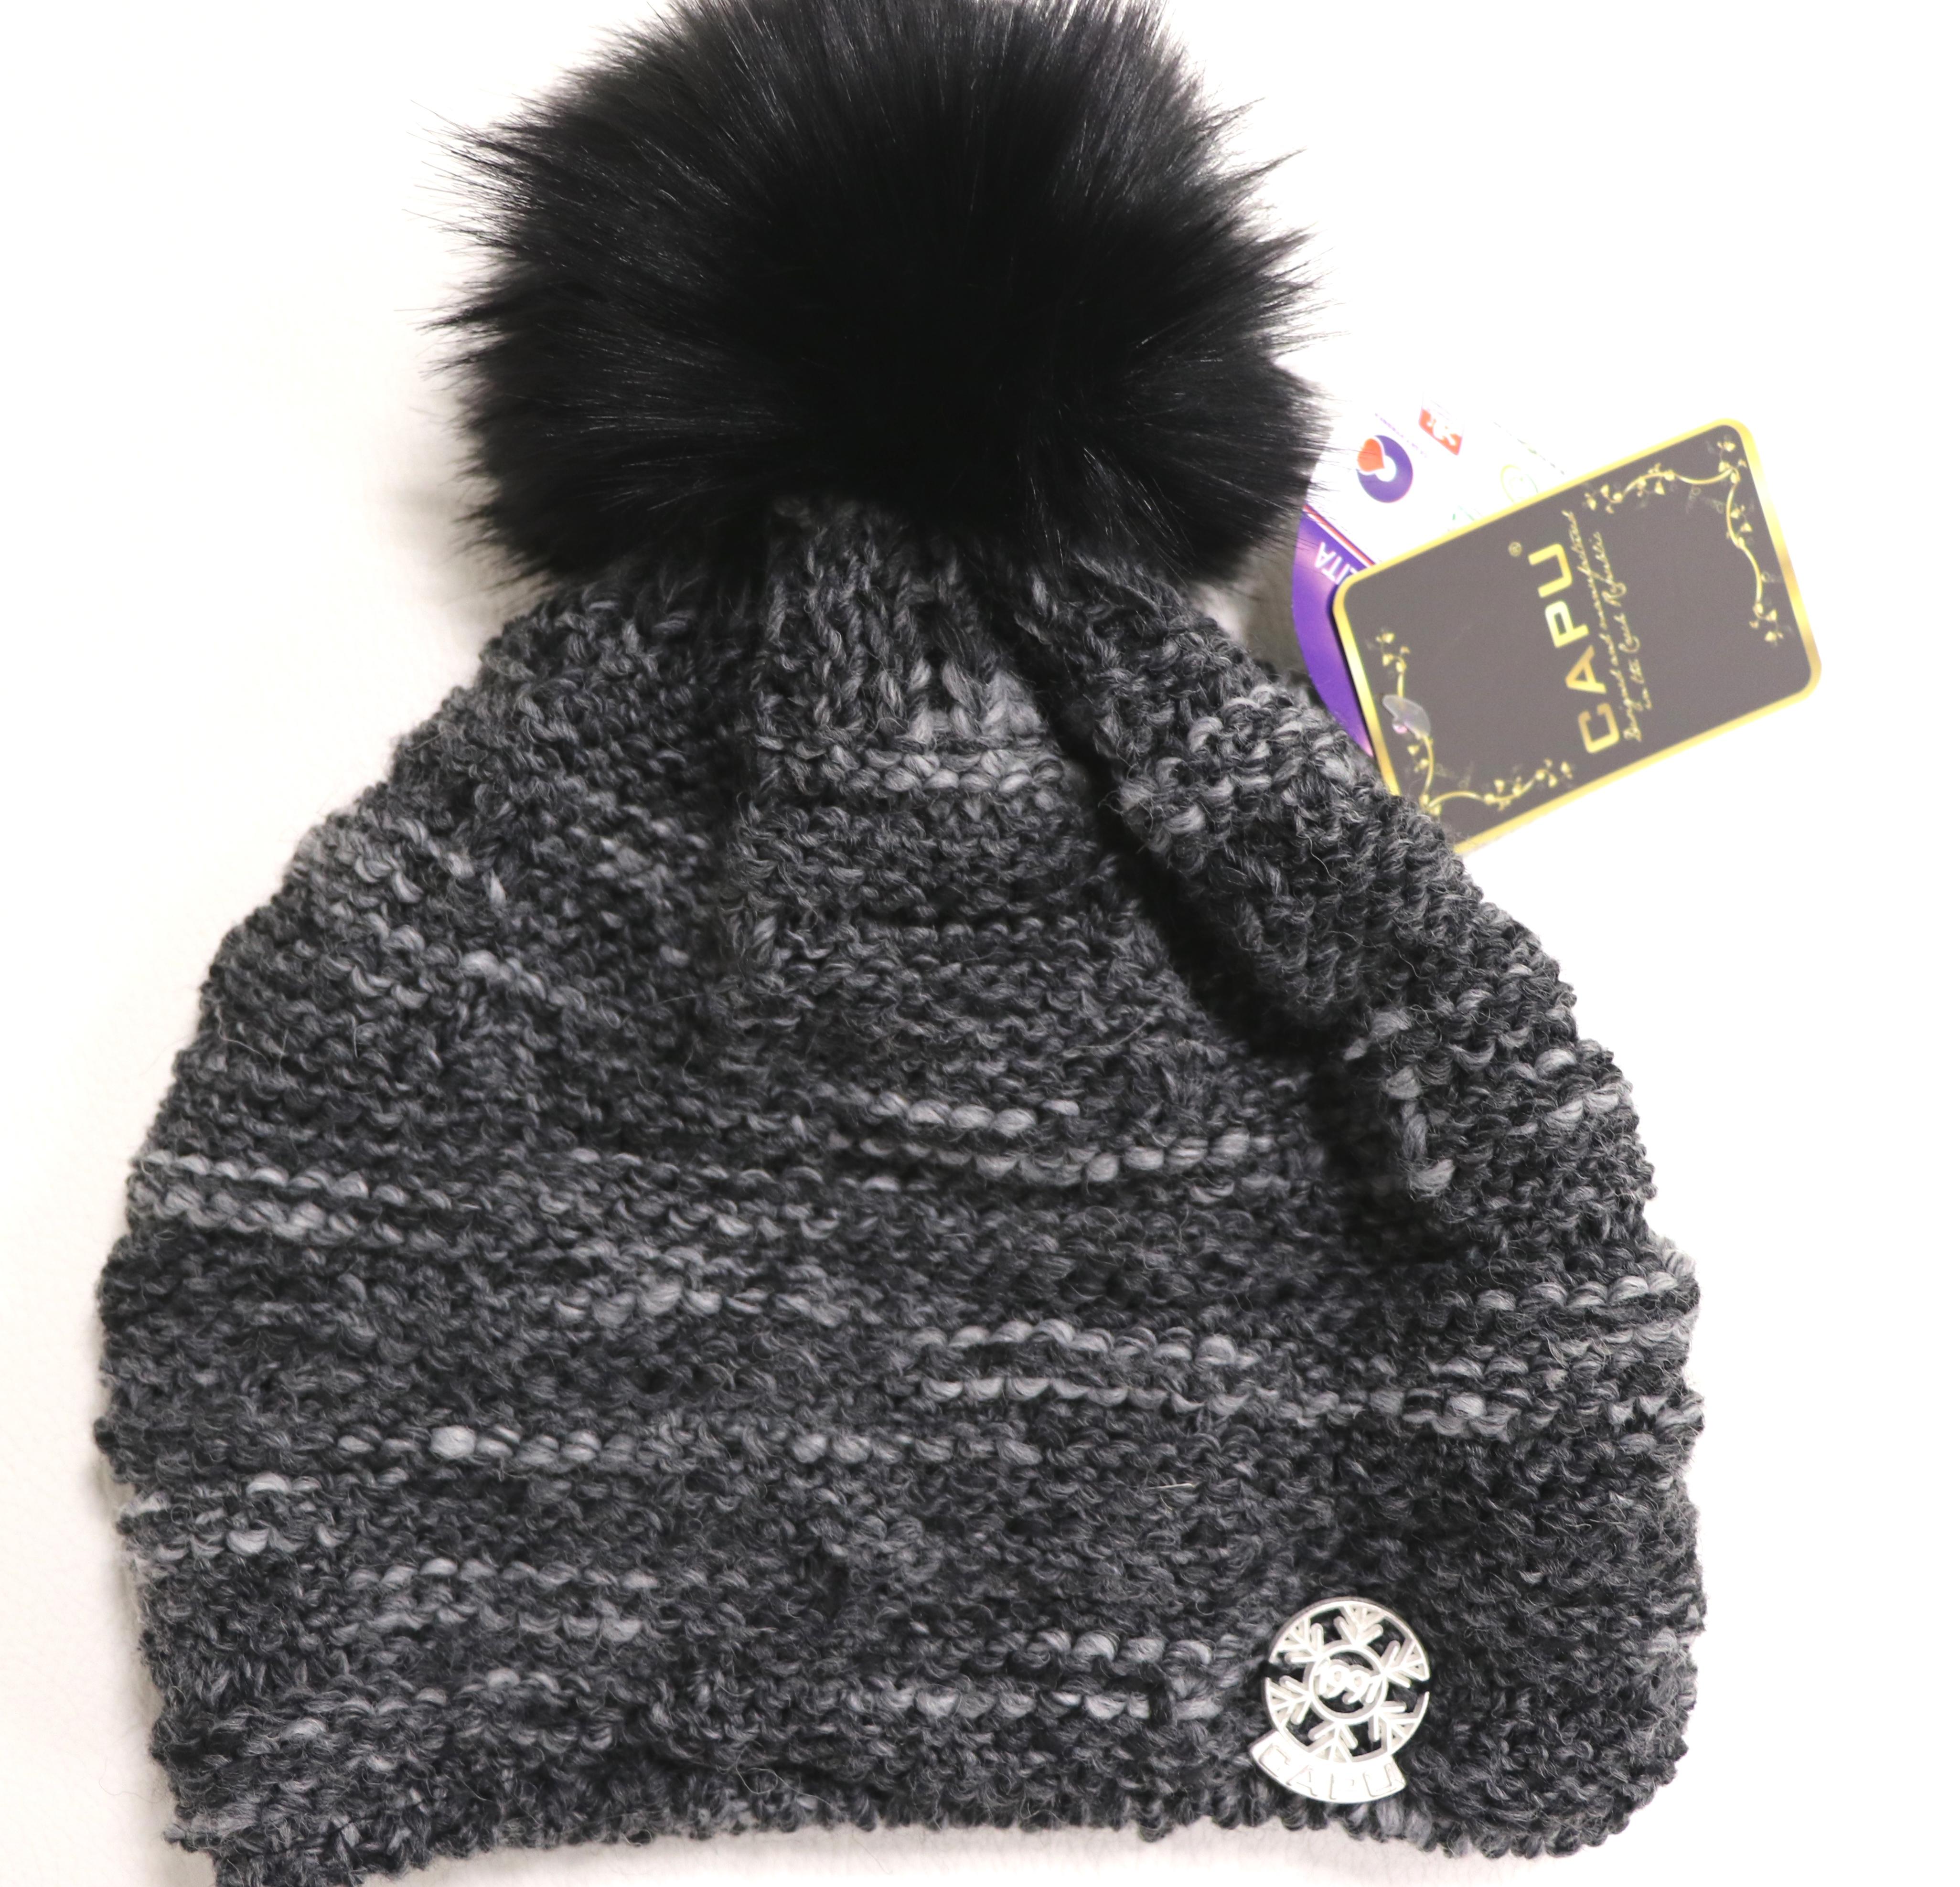 699d84606 Dámska móda | Zimná čiapka s brmbolcom CAPU 376 sivá | Mayoral ...